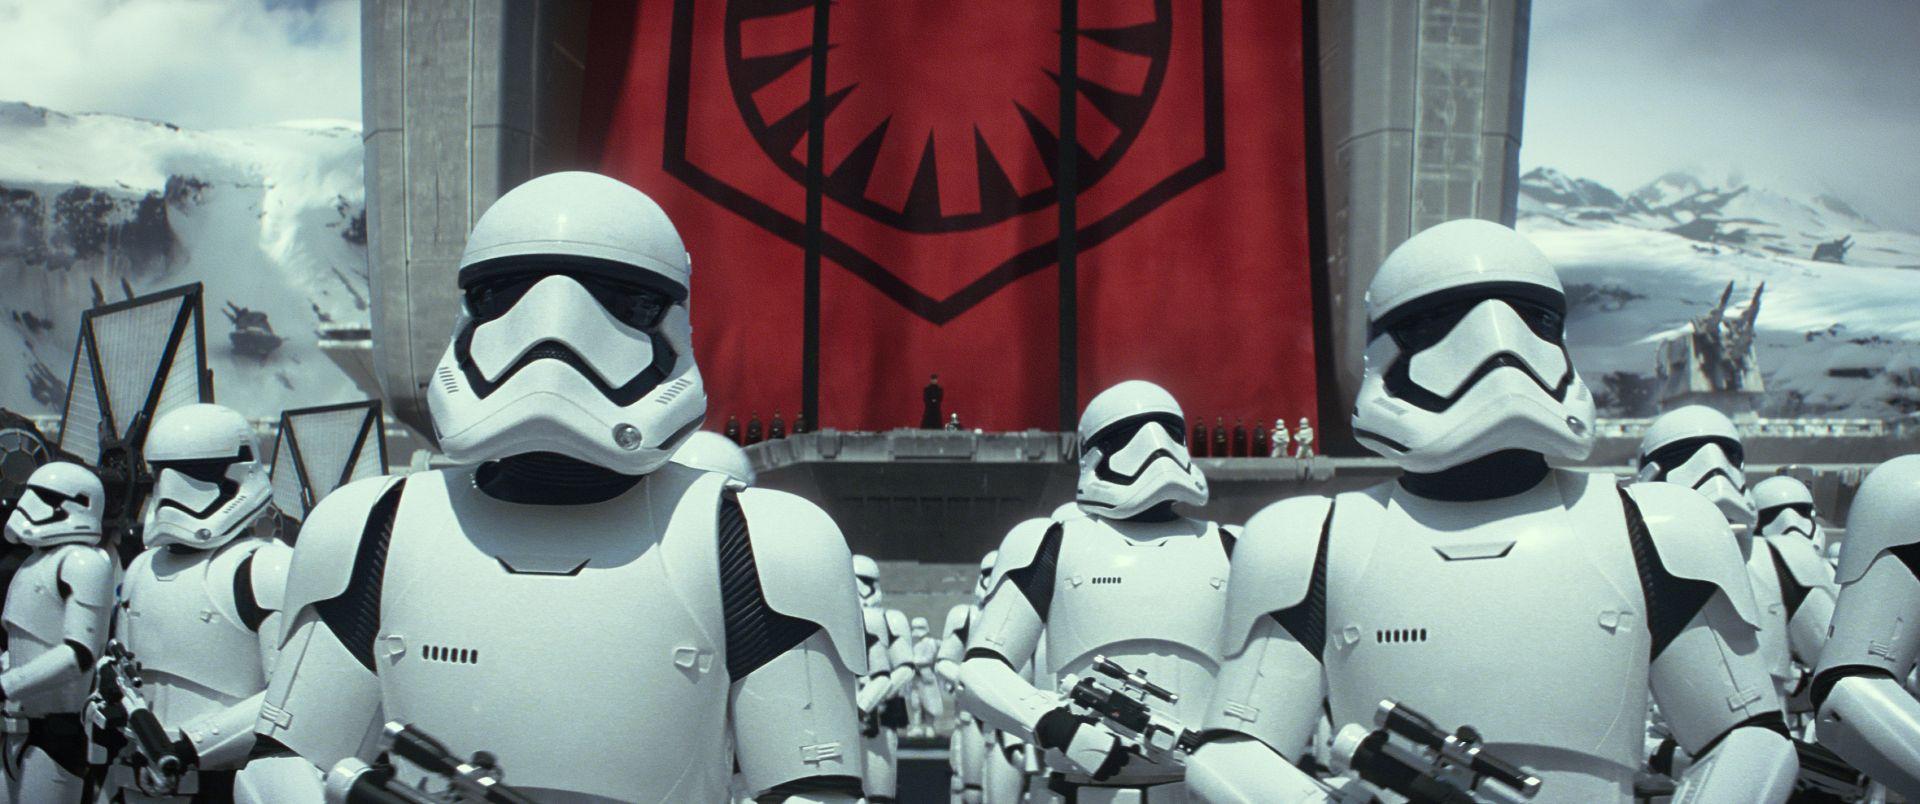 "Fotograma de ""Star Wars: El despertar de la fuerza"" (Lucasfilm / Bad Robot / The Walt Disney Company), dirigida por J.J. Abrams."